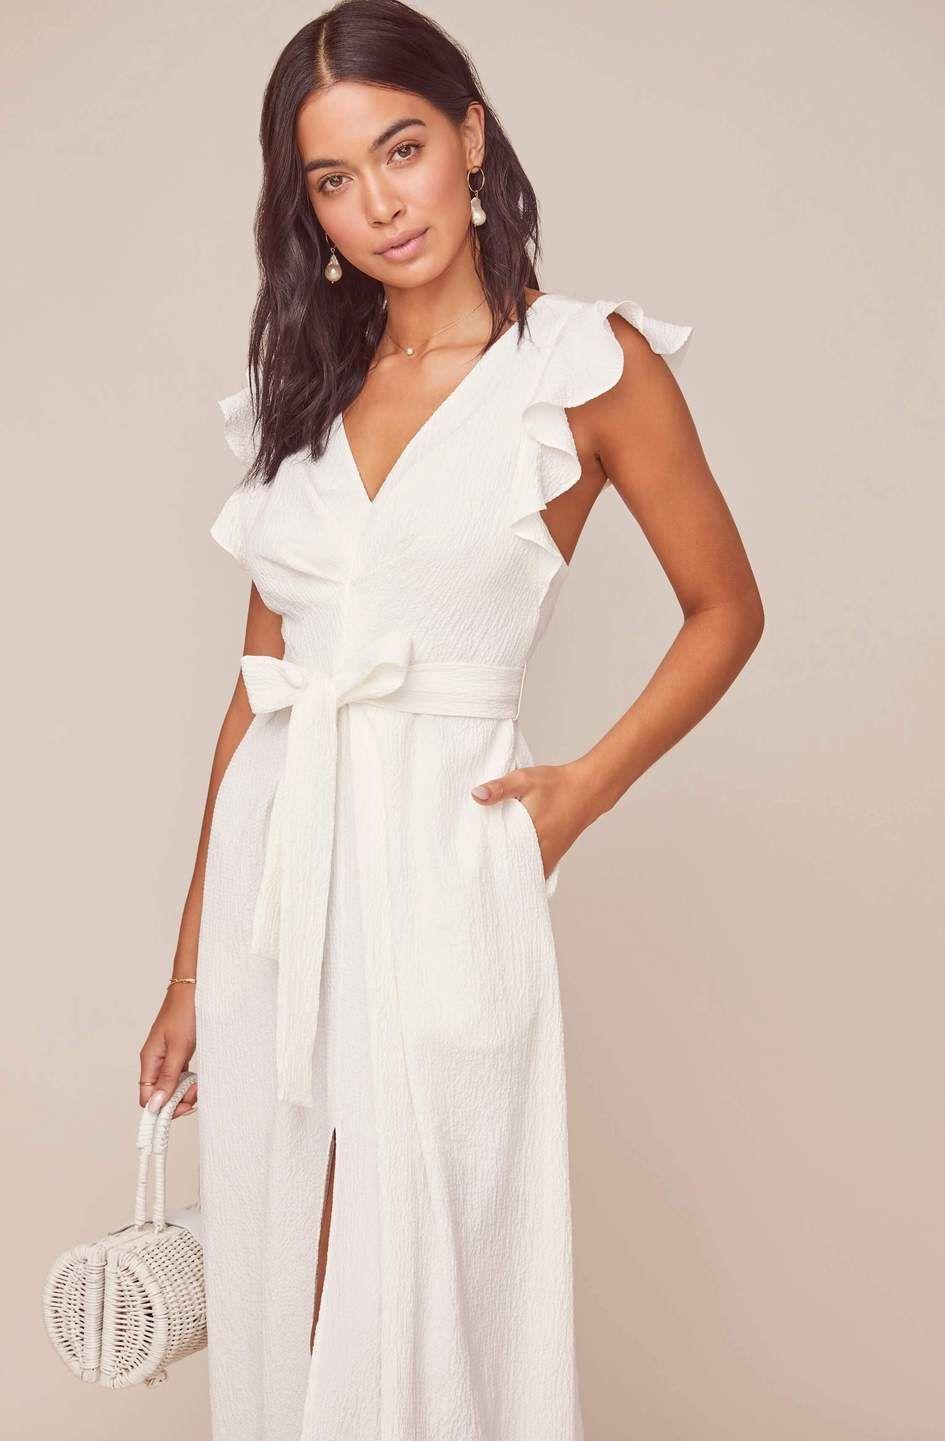 41+ Ruffle sleeve dress ideas